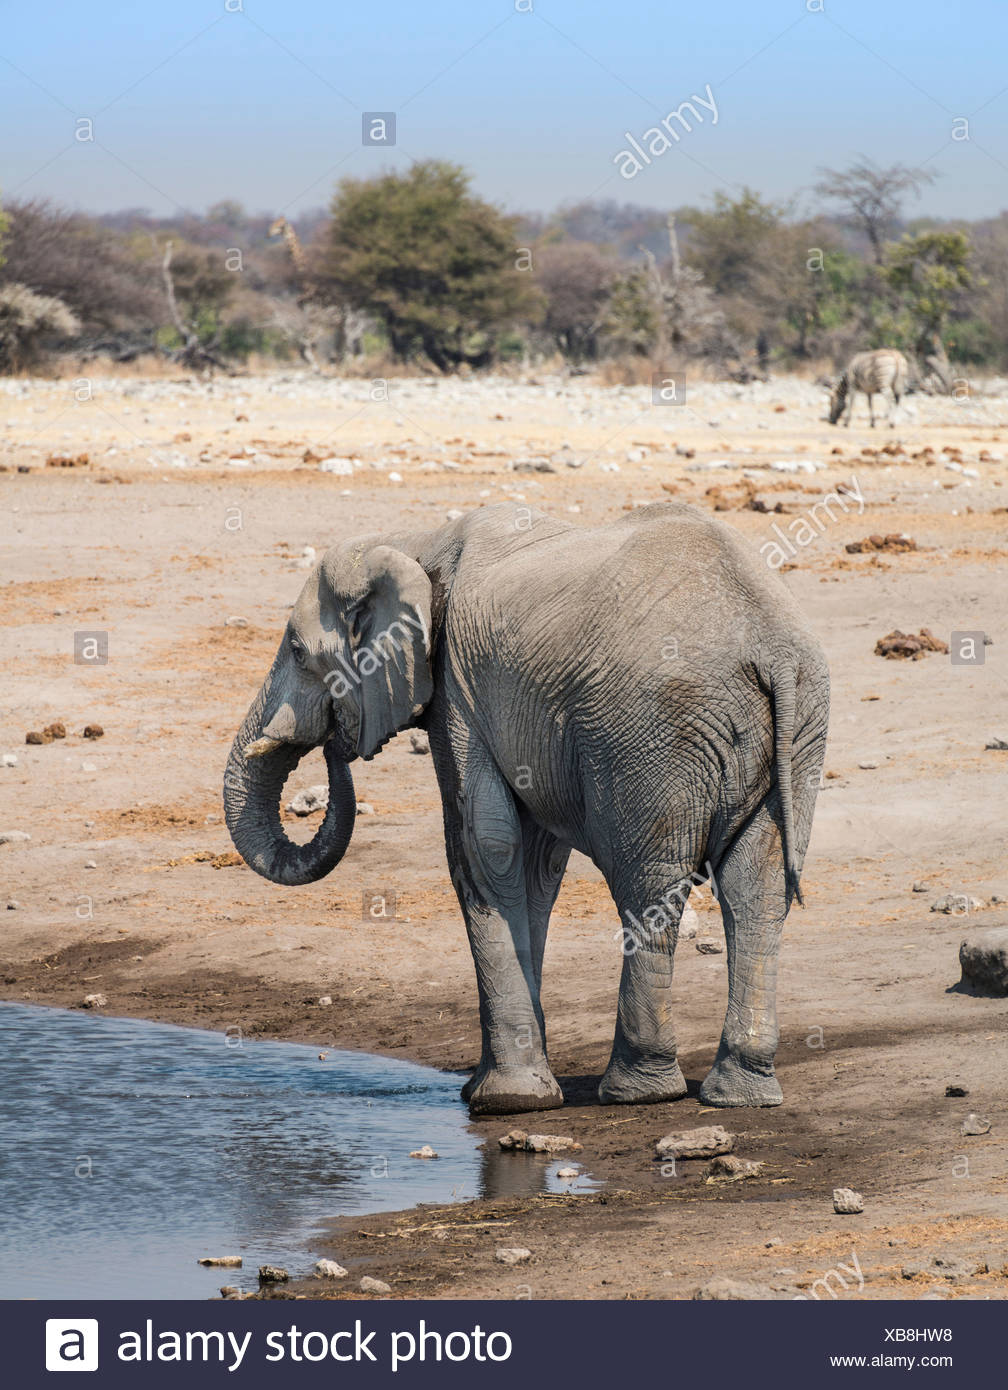 L'éléphant africain (Loxodonta africana) à l'Chudop waterhole, Etosha National Park, Namibie Photo Stock